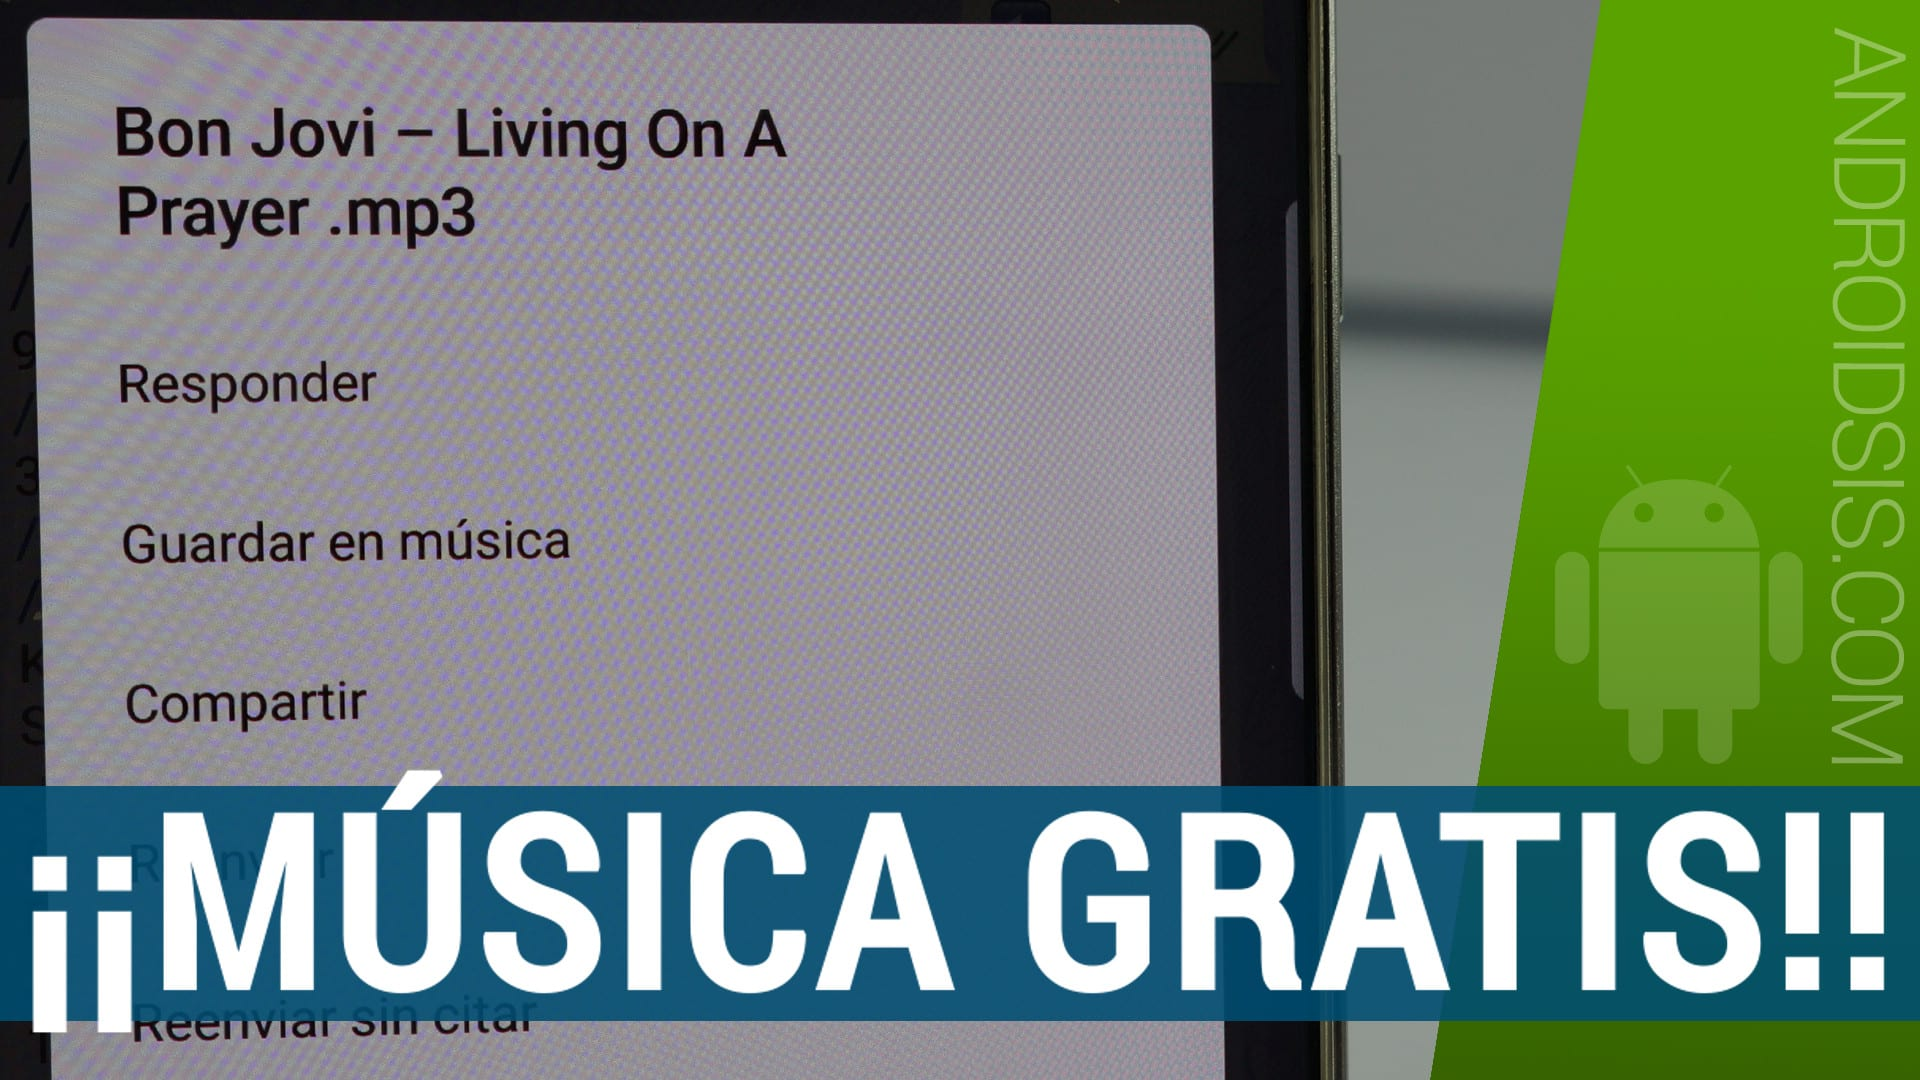 Bajar música gratis